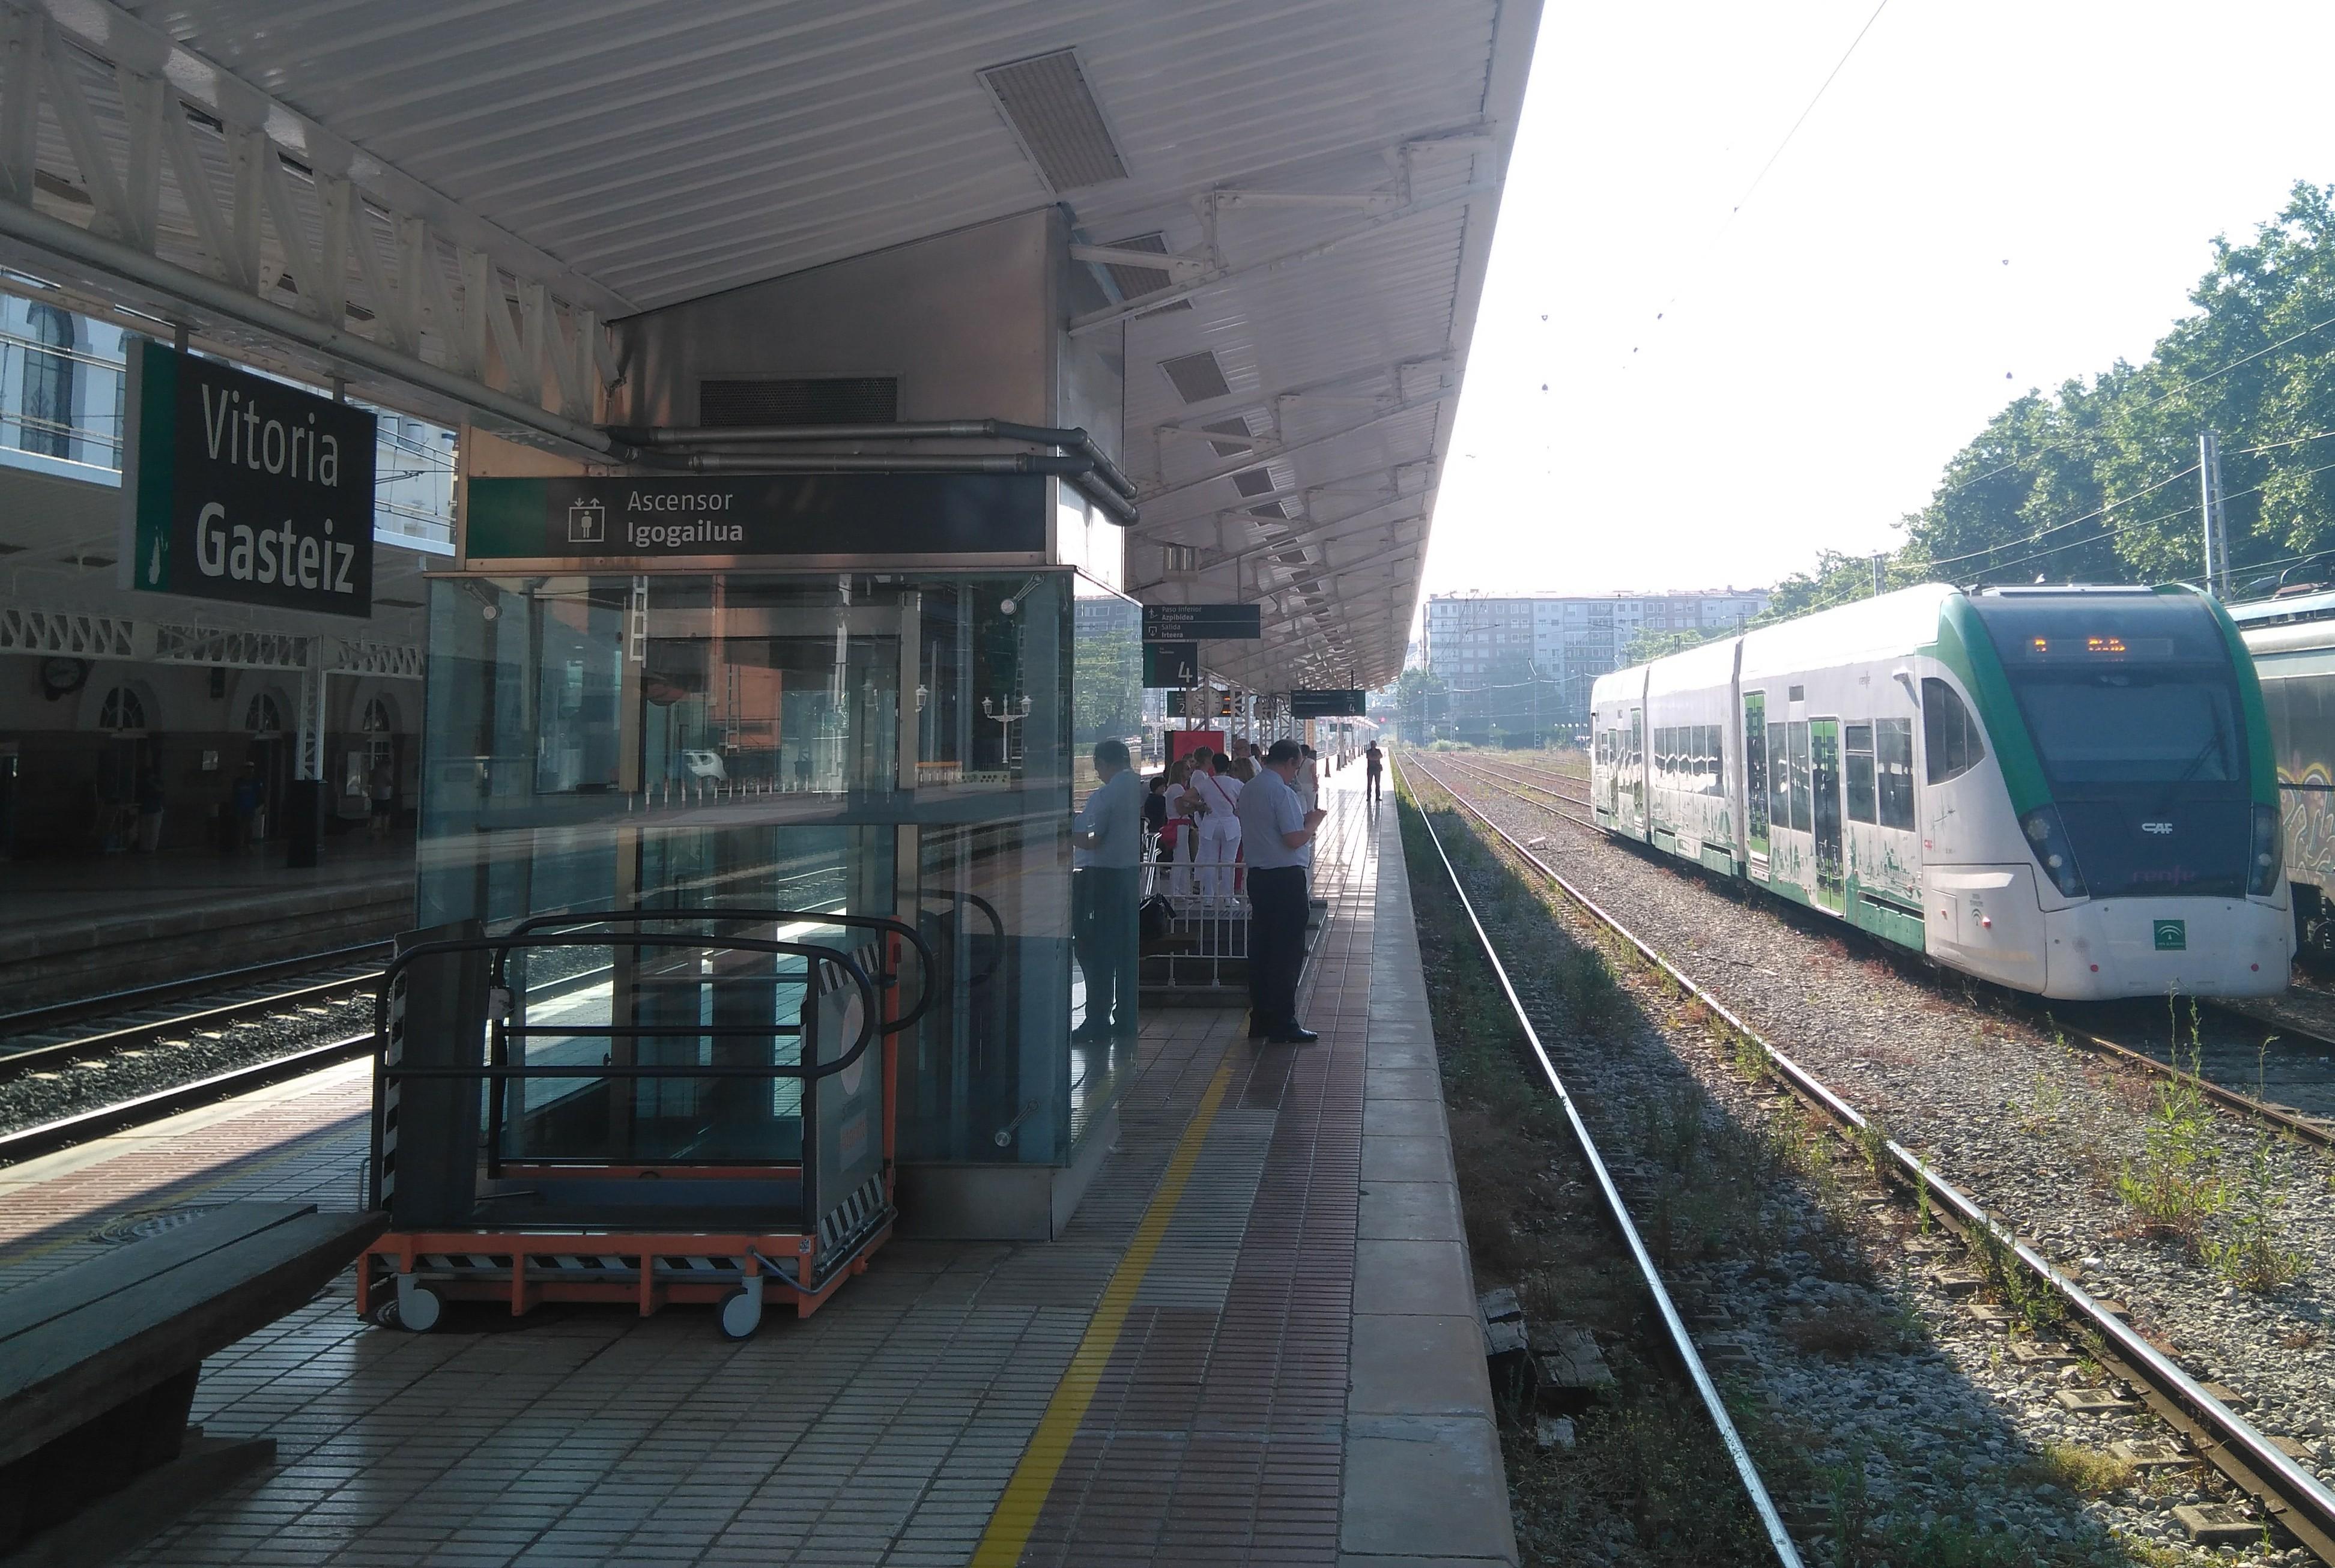 Unidad del Tren Tram junto al adén de la estación de ferrocarril de Vitoria.